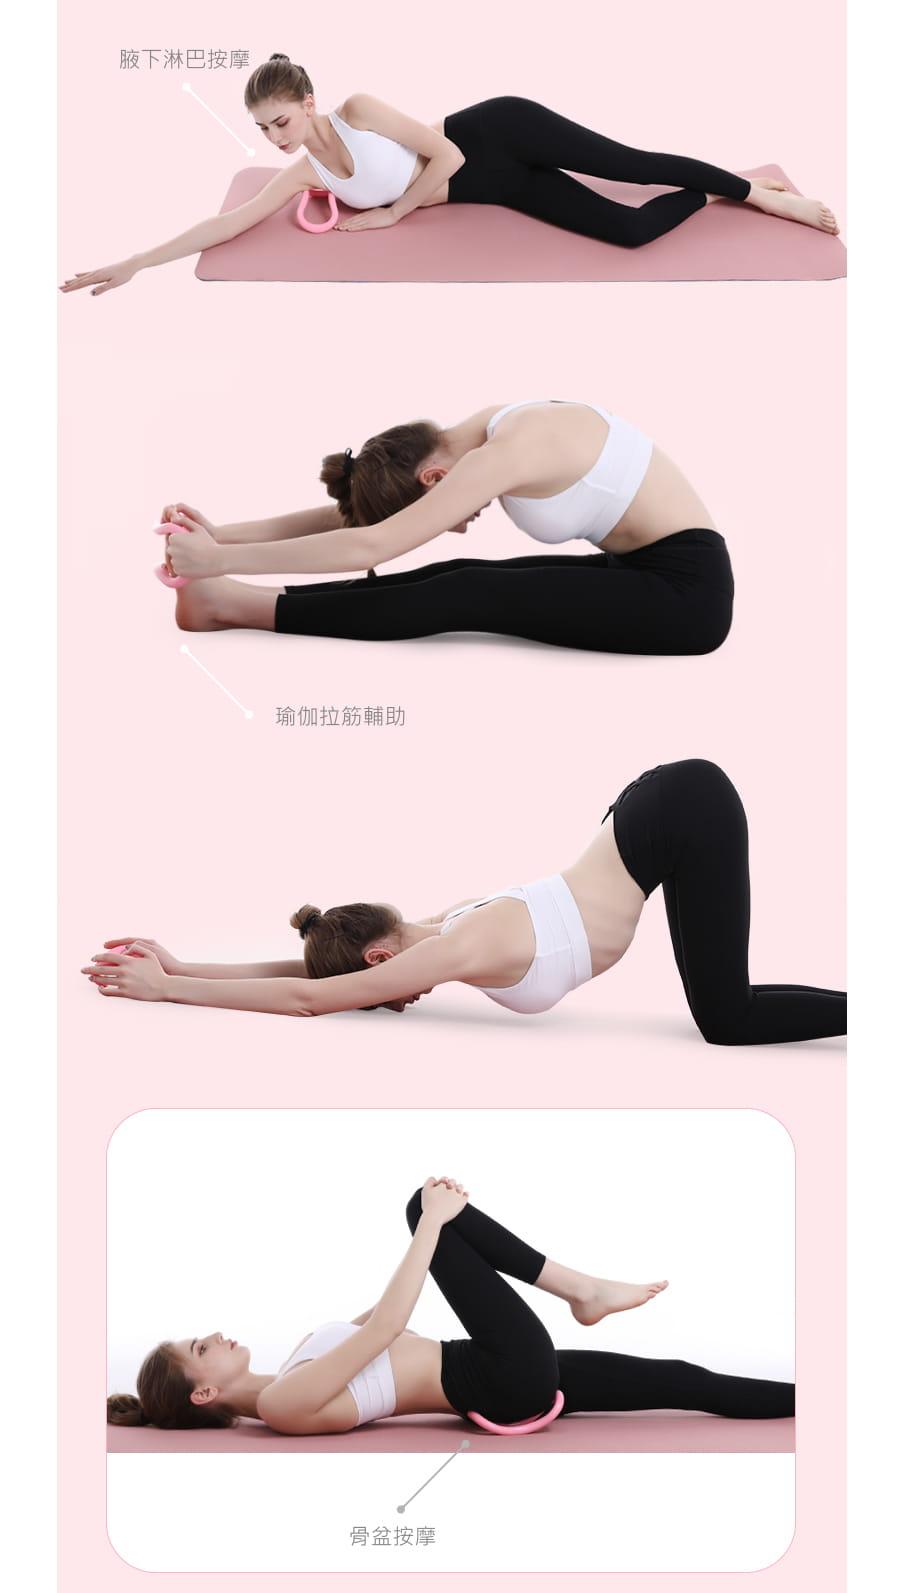 【Un-Sport高機能】健身按摩瑜珈環/開肩瘦背/普拉提斯伸展環-超值2入 2